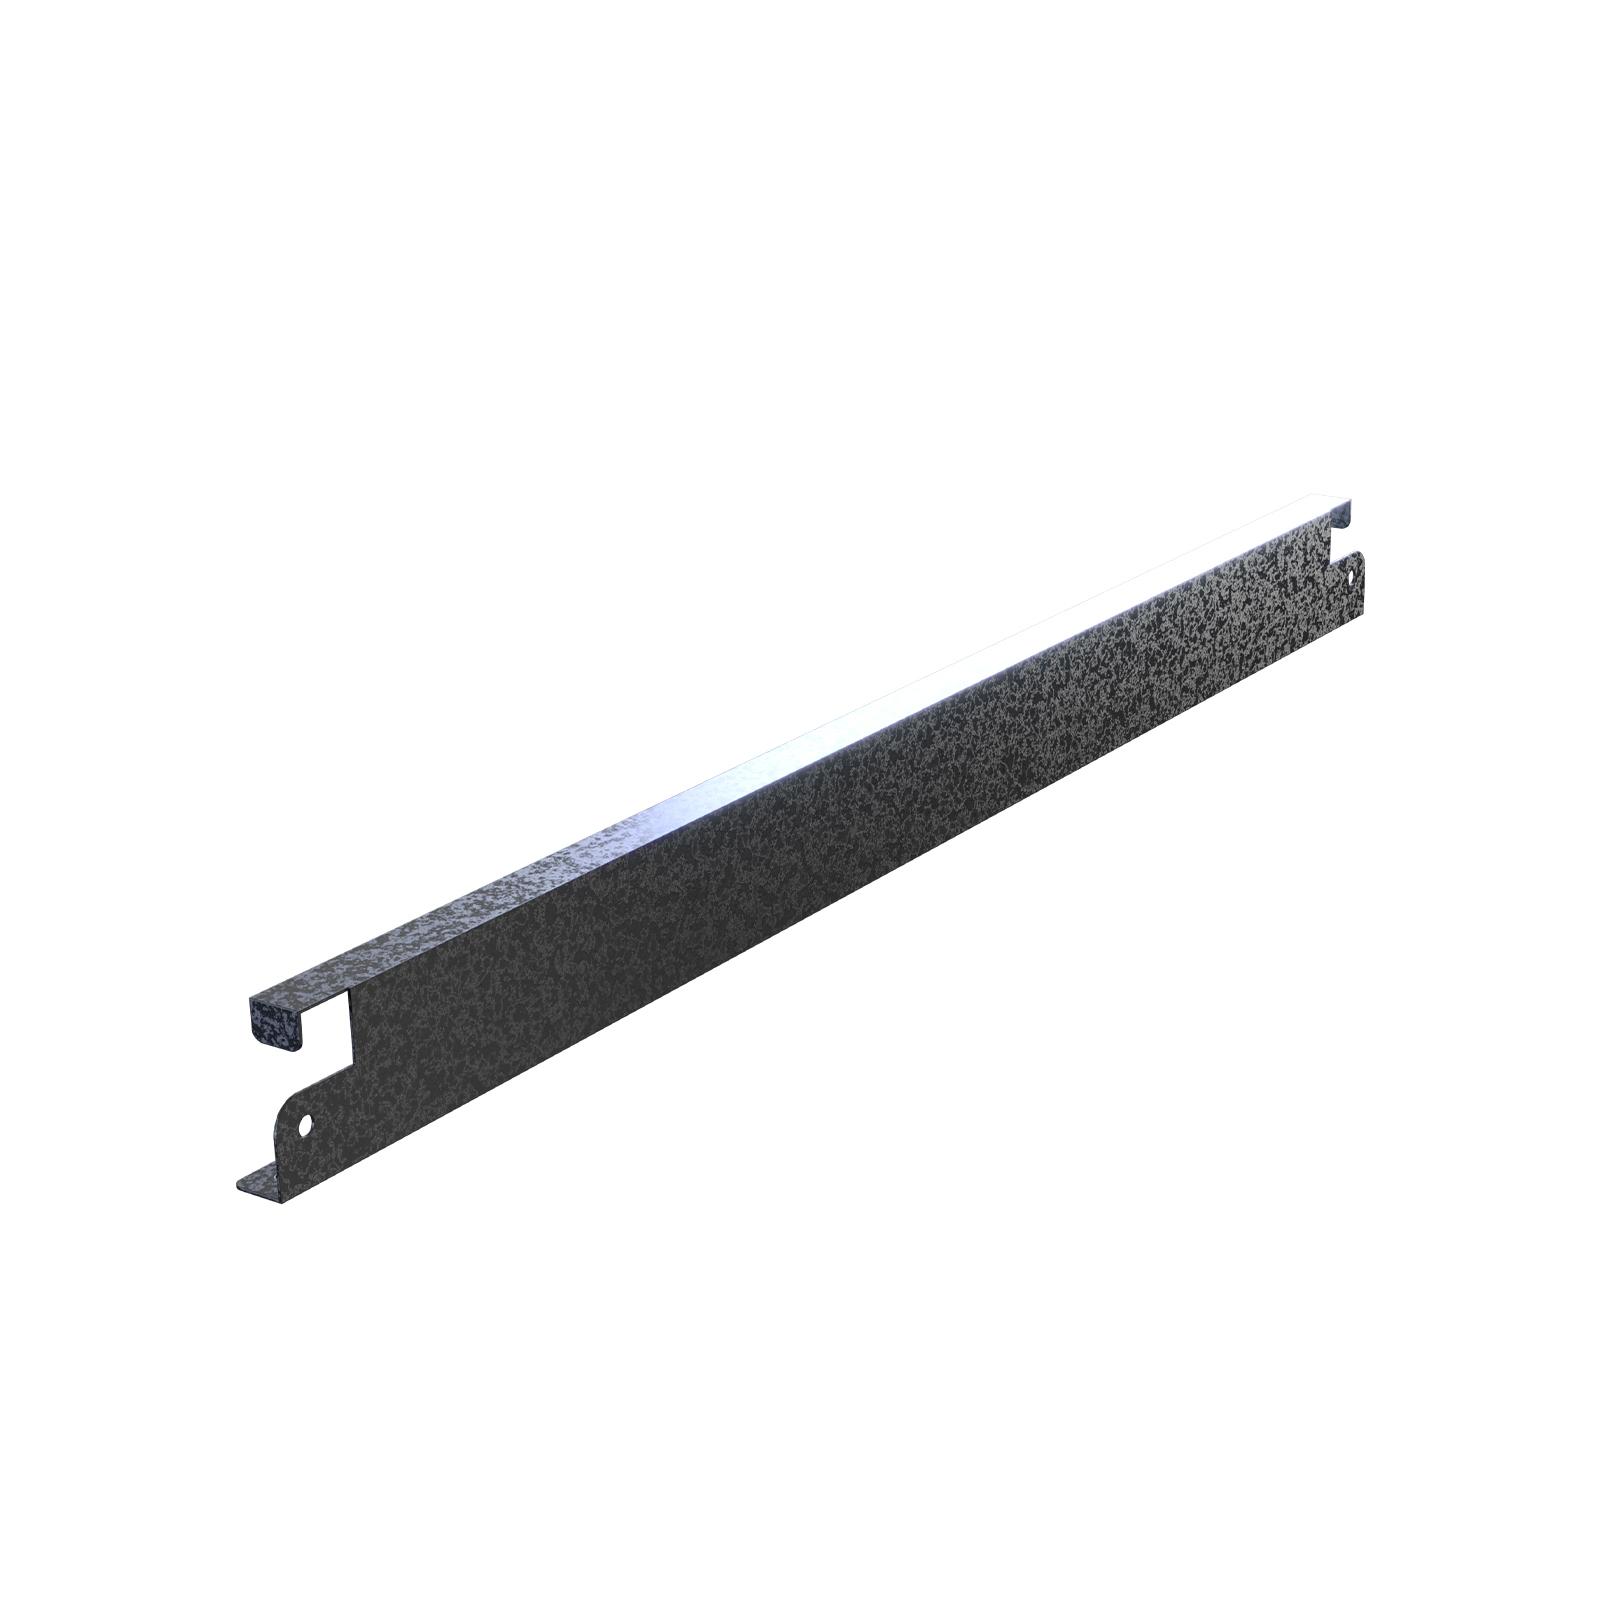 Rack It 400kg 520mm Shelf Support Brace For 530mm Rack Depth